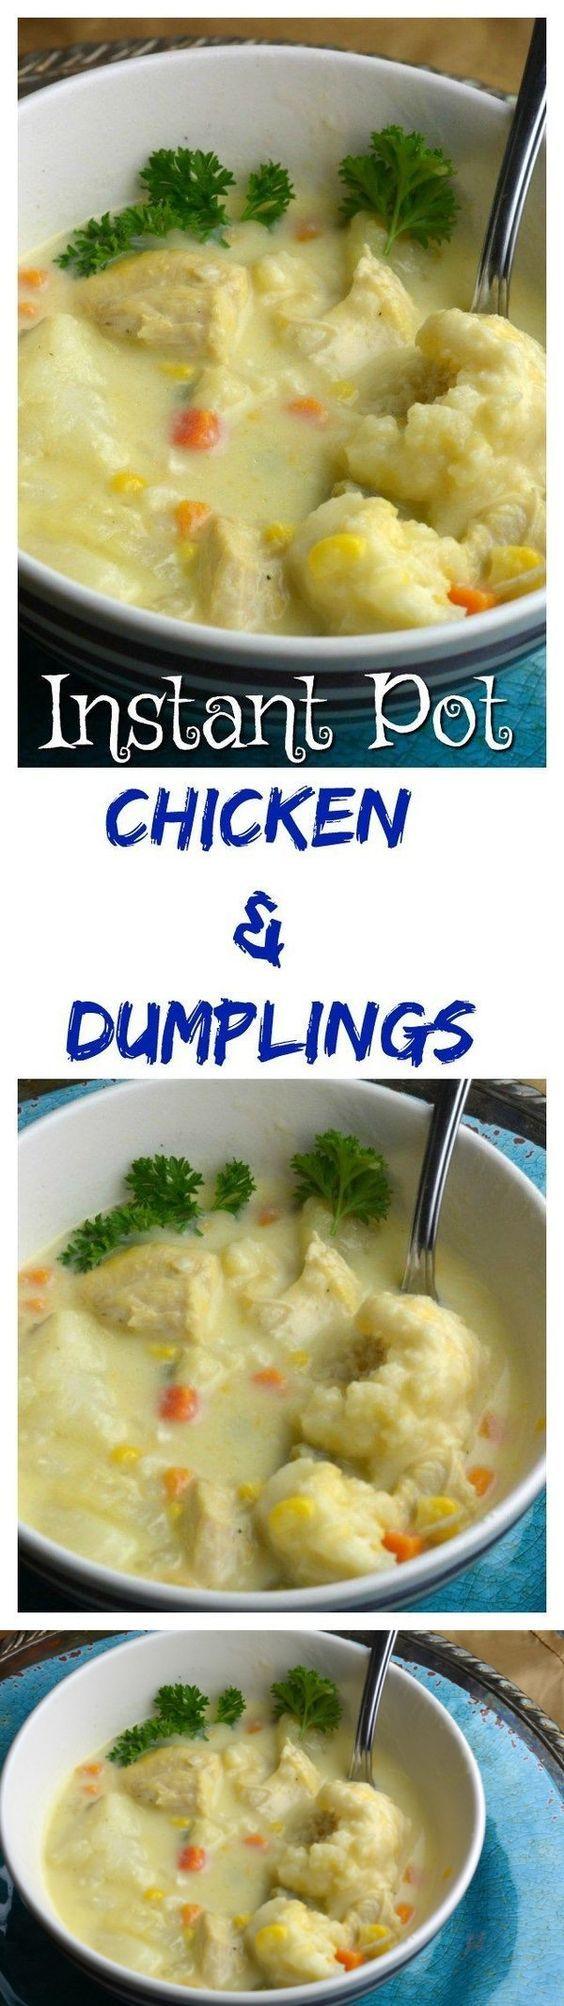 instant pot chicken and dumplings  recipe  instant pot